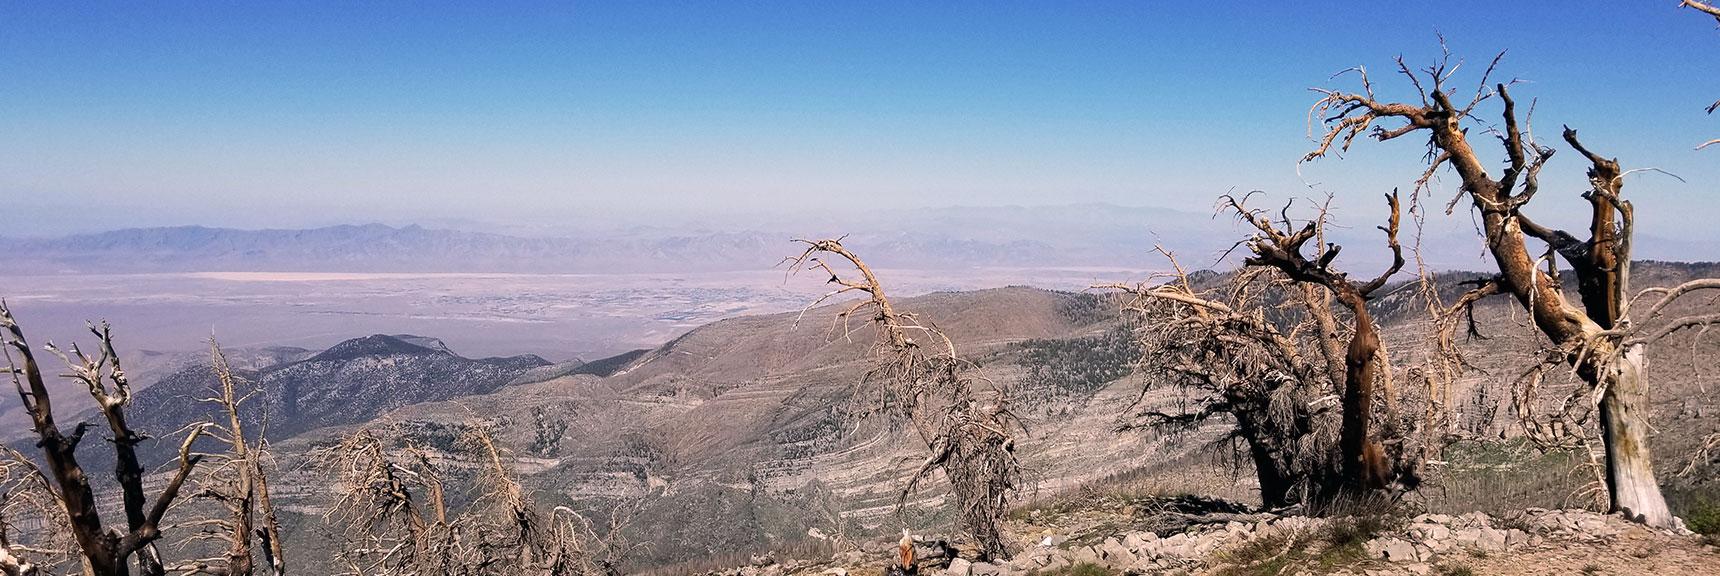 Pahrump, Telescope Peak Viewed from Griffith Peak Summit, Nevada